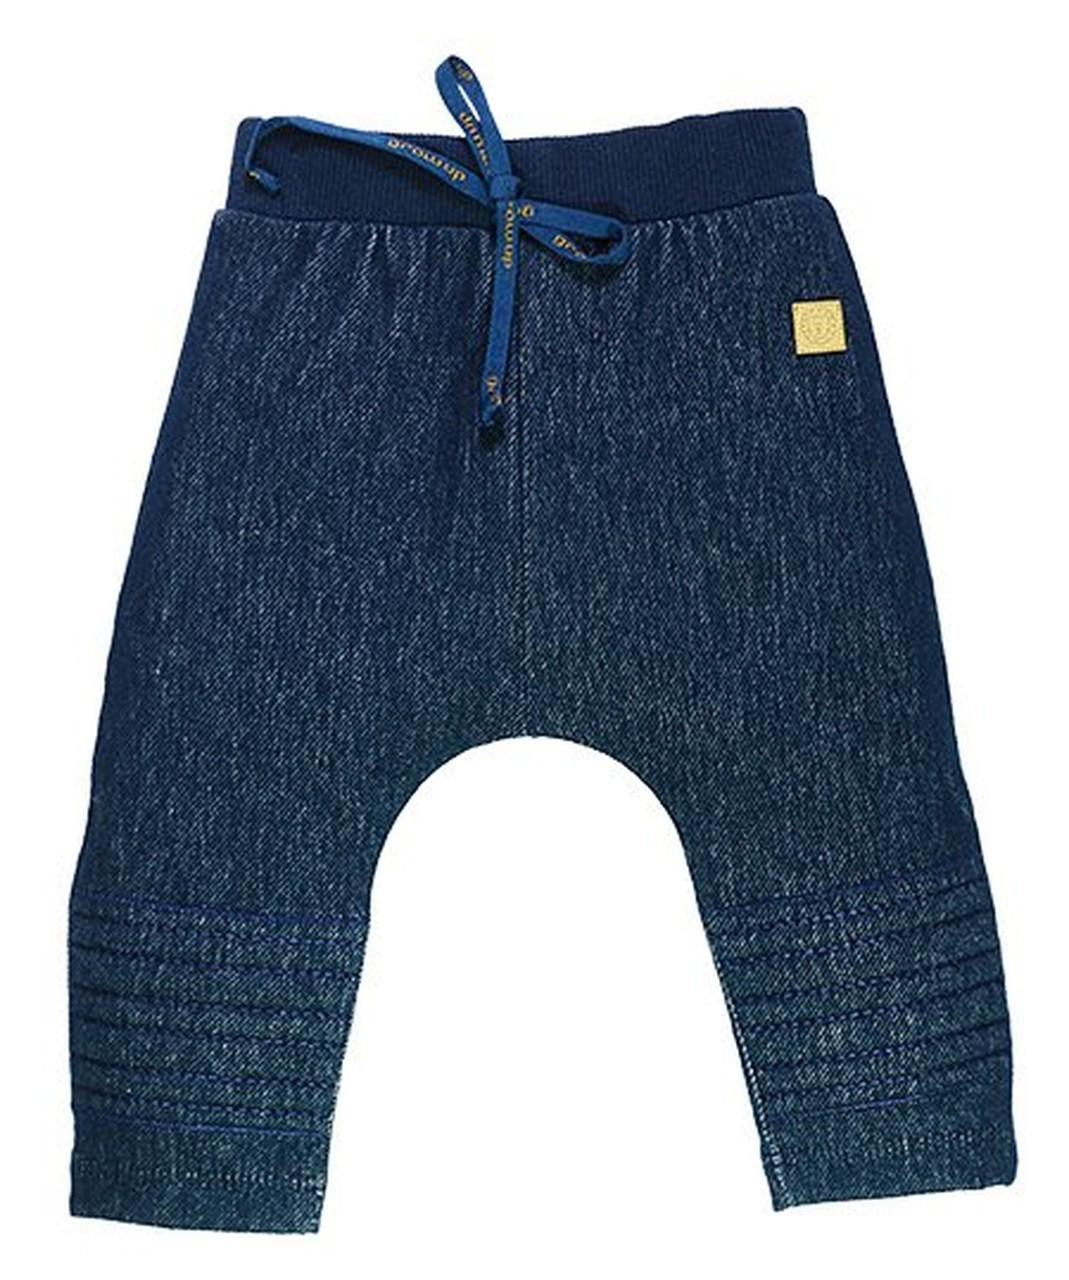 Calça Infantil Unissex em Cotton Blue Denim Grow Up